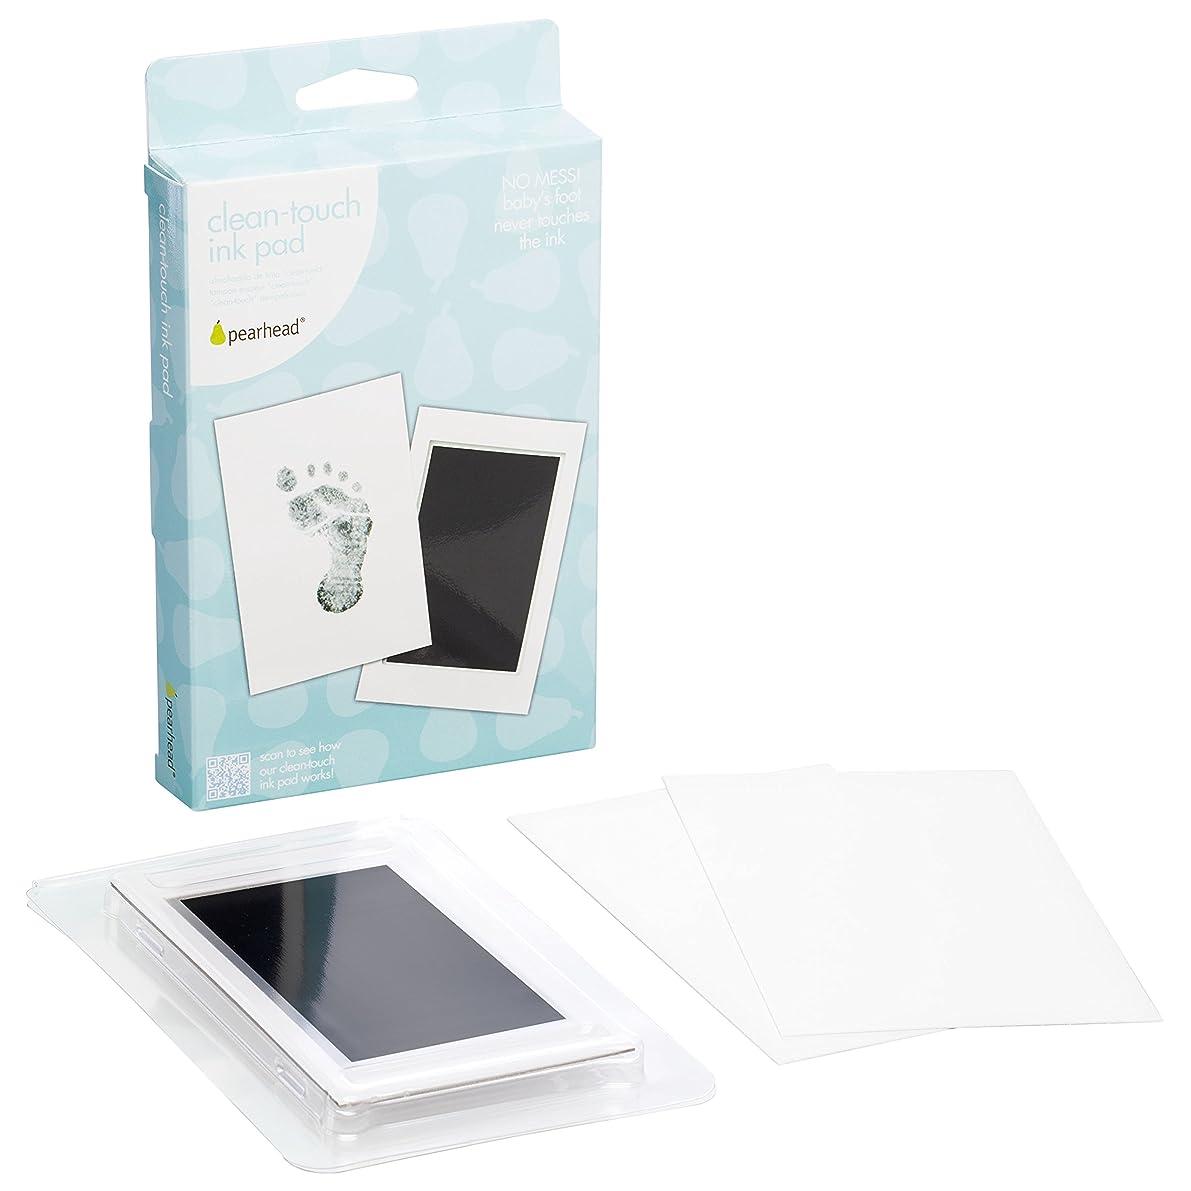 "Pearhead Newborn Baby Handprint or Footprint ""Clean-Touch"" Ink Pad, 2 Uses, Black"